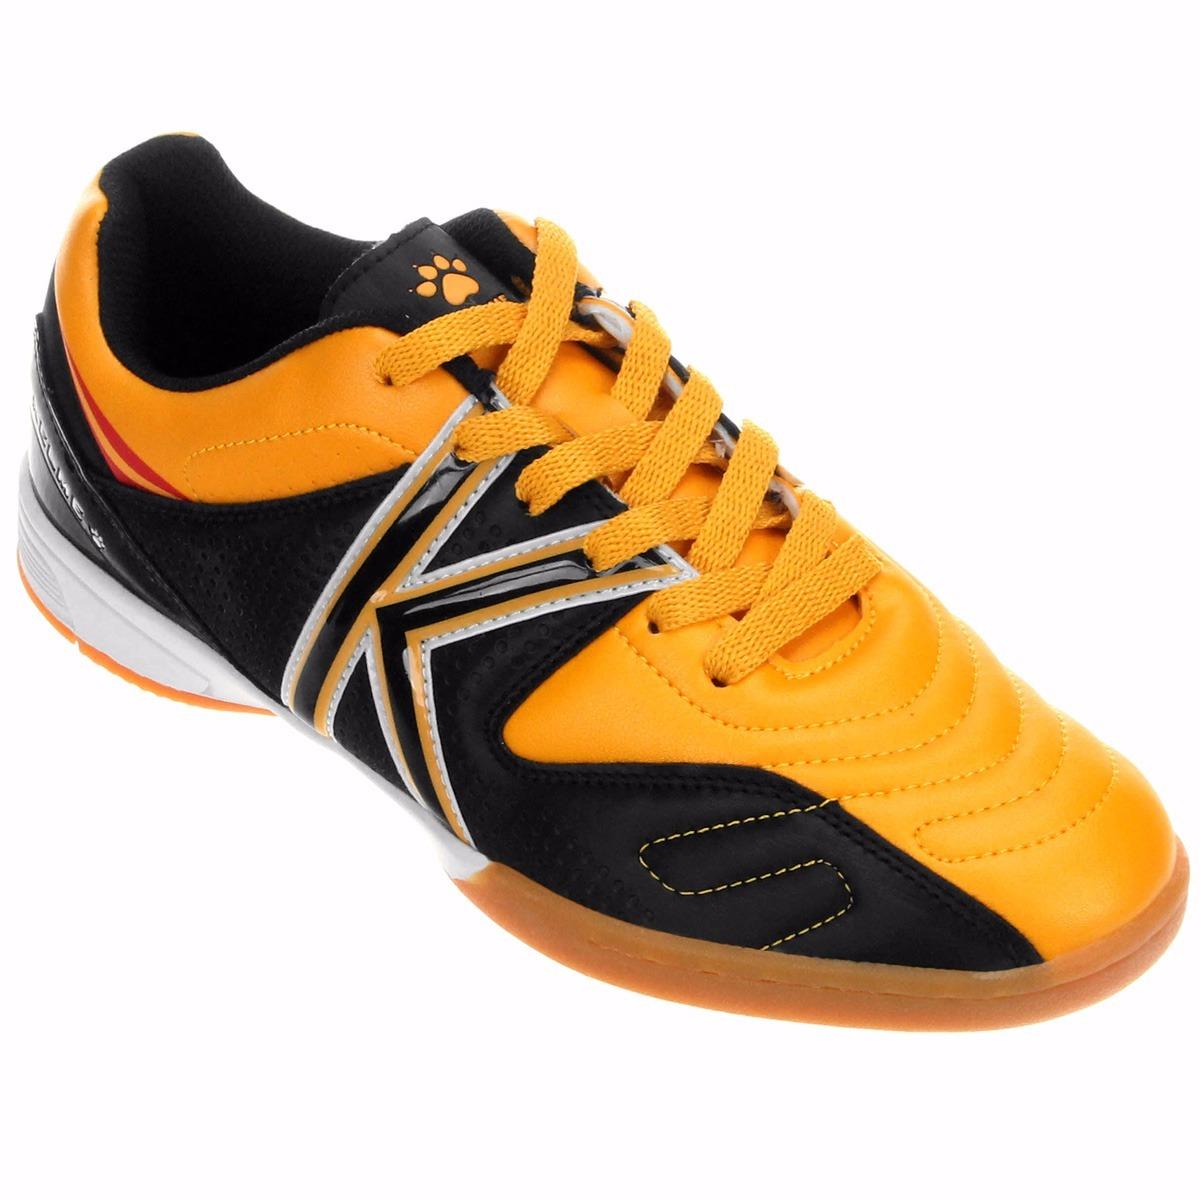 b8c150d7bff1c Chuteira Kelme Madrid Indoor Futsal Infantil + Nf - R  129